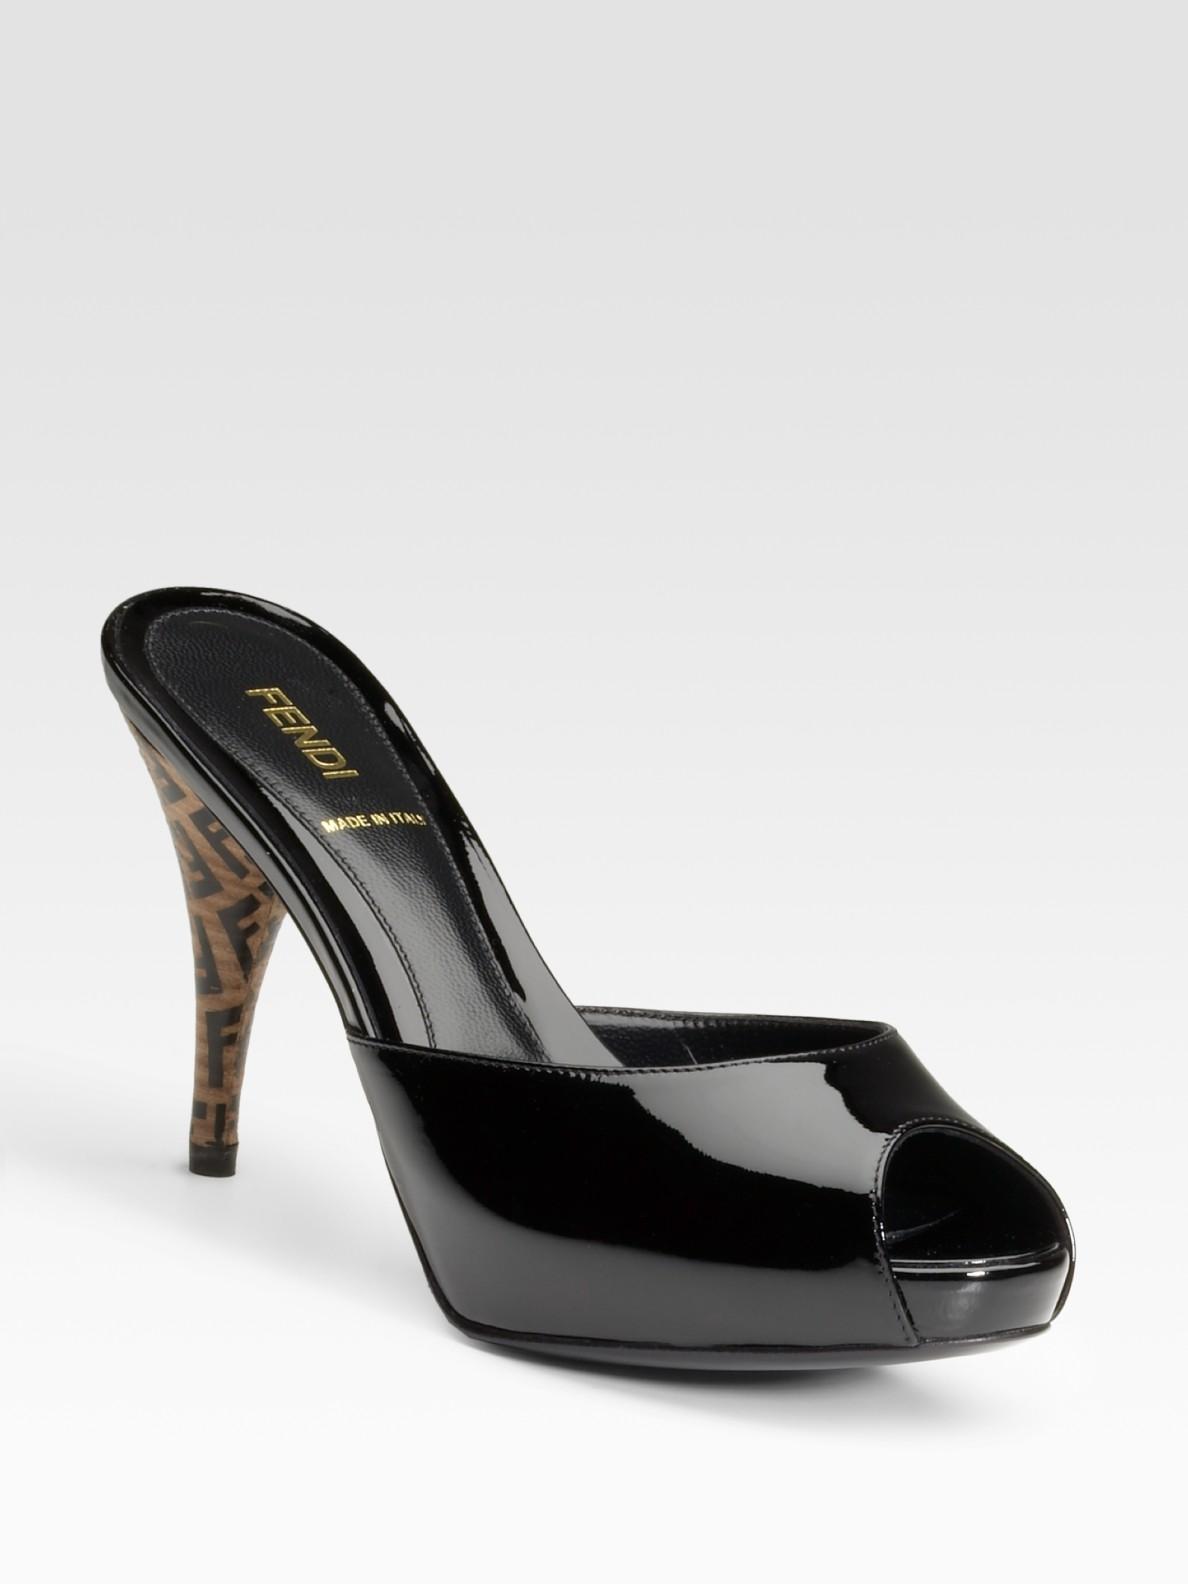 Fendi Ff Superstar Patent Leather Slides In Black Lyst